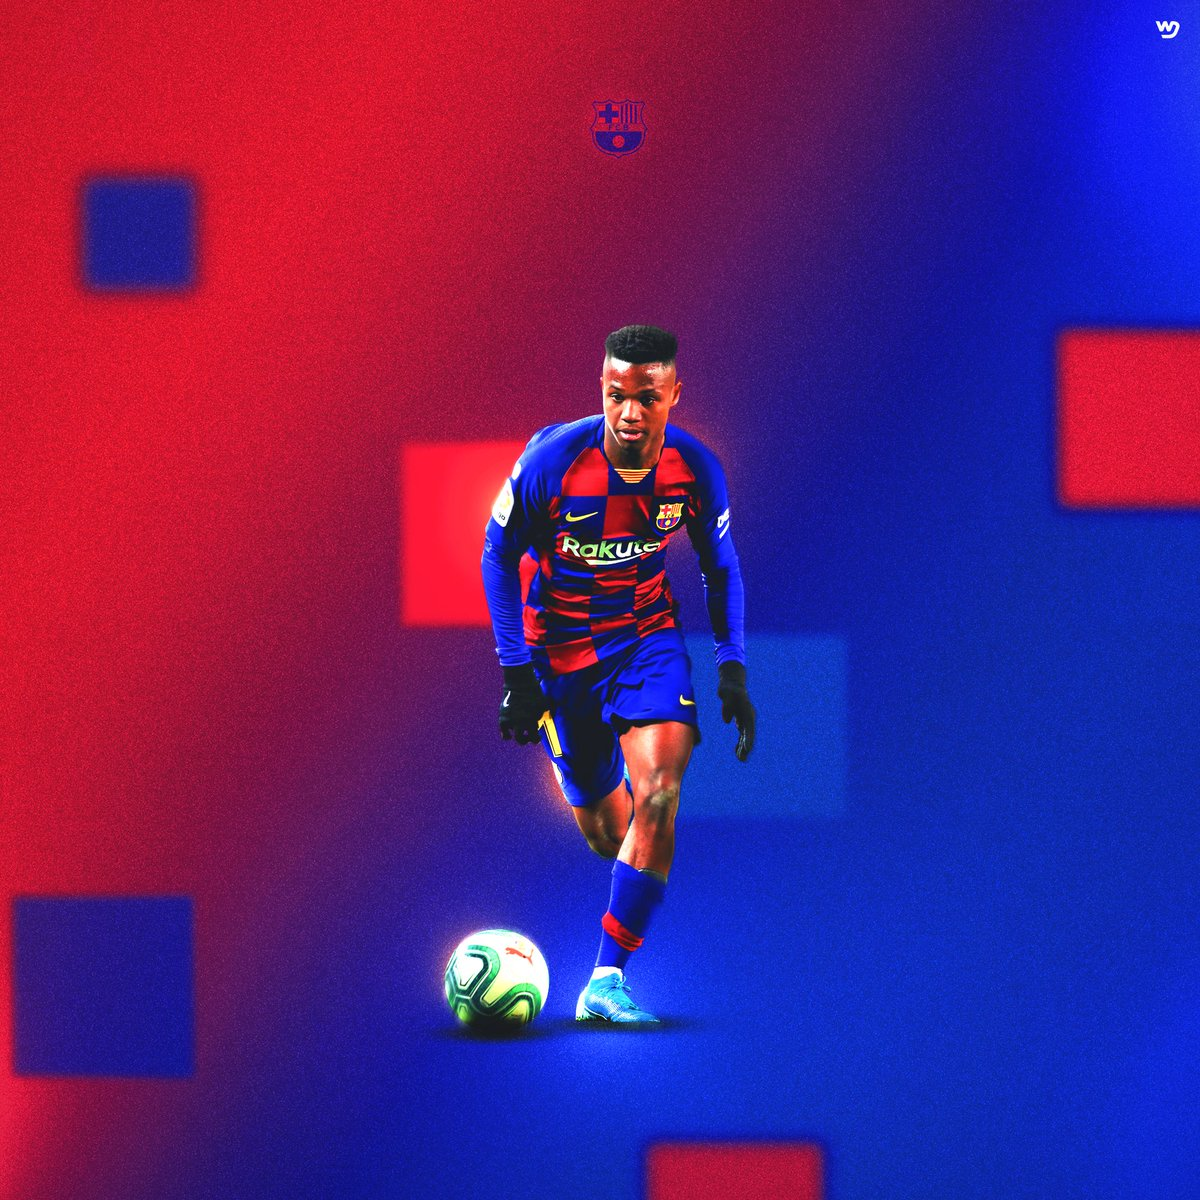 Barca Worldwide On Twitter Next Generation Of Fc Barcelona Edit Walmsdesigns